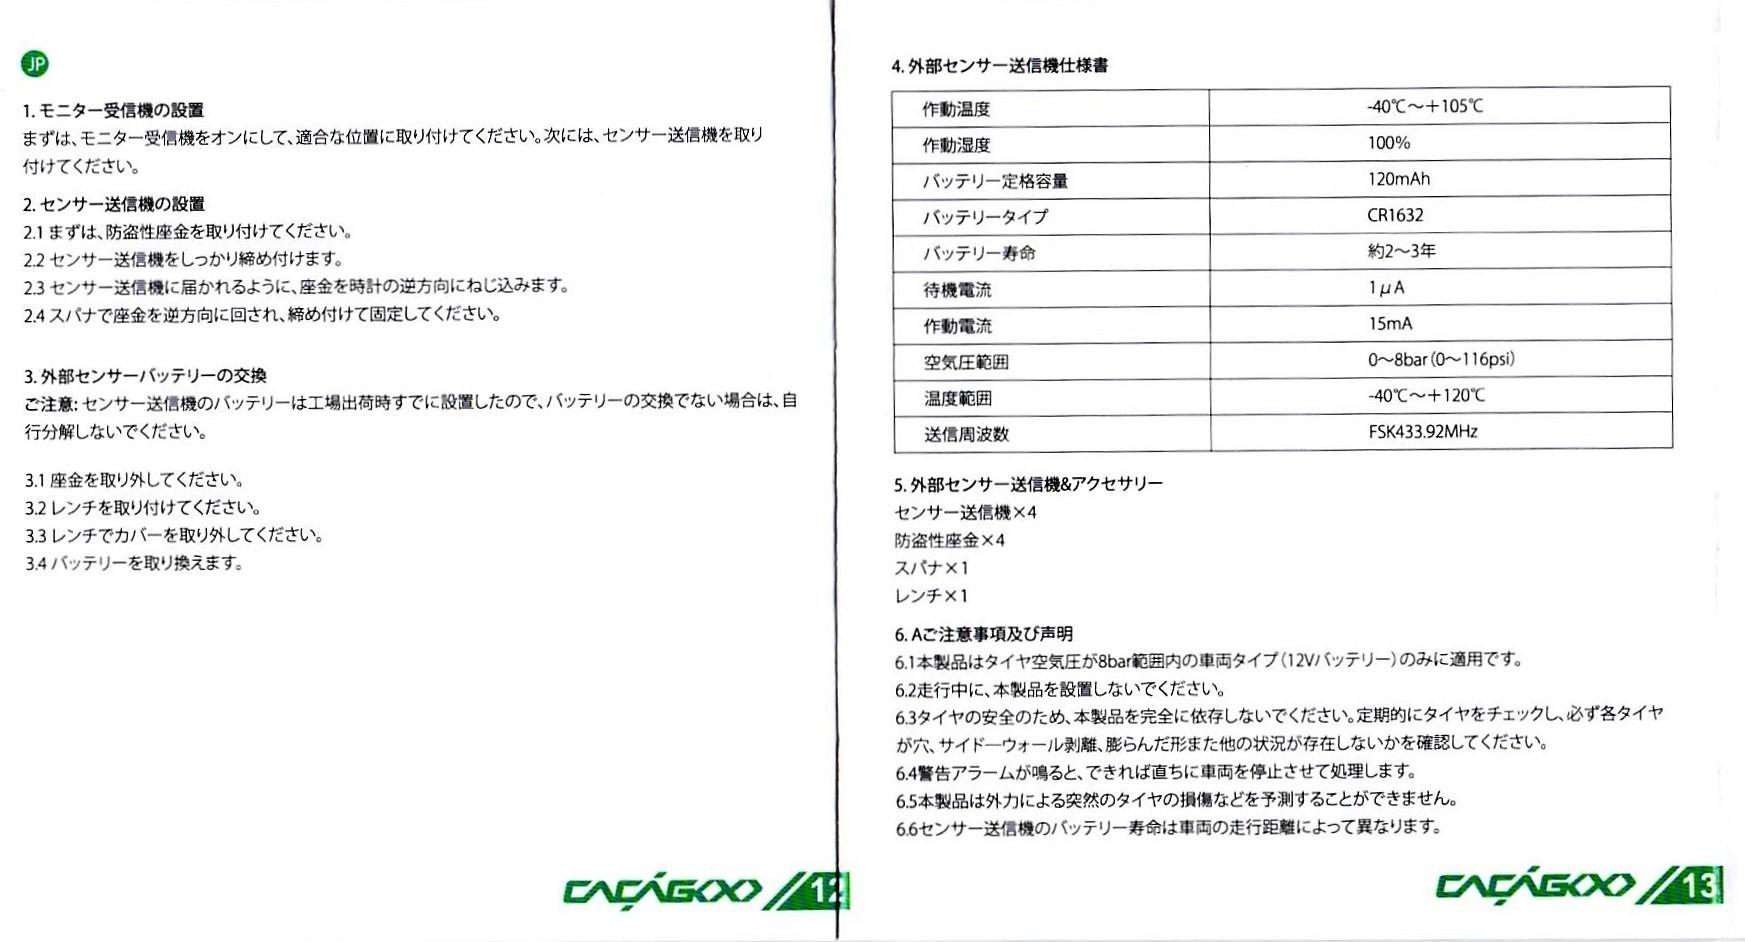 CACAGOO TPMS タイヤ空気圧監視システム 取説 12